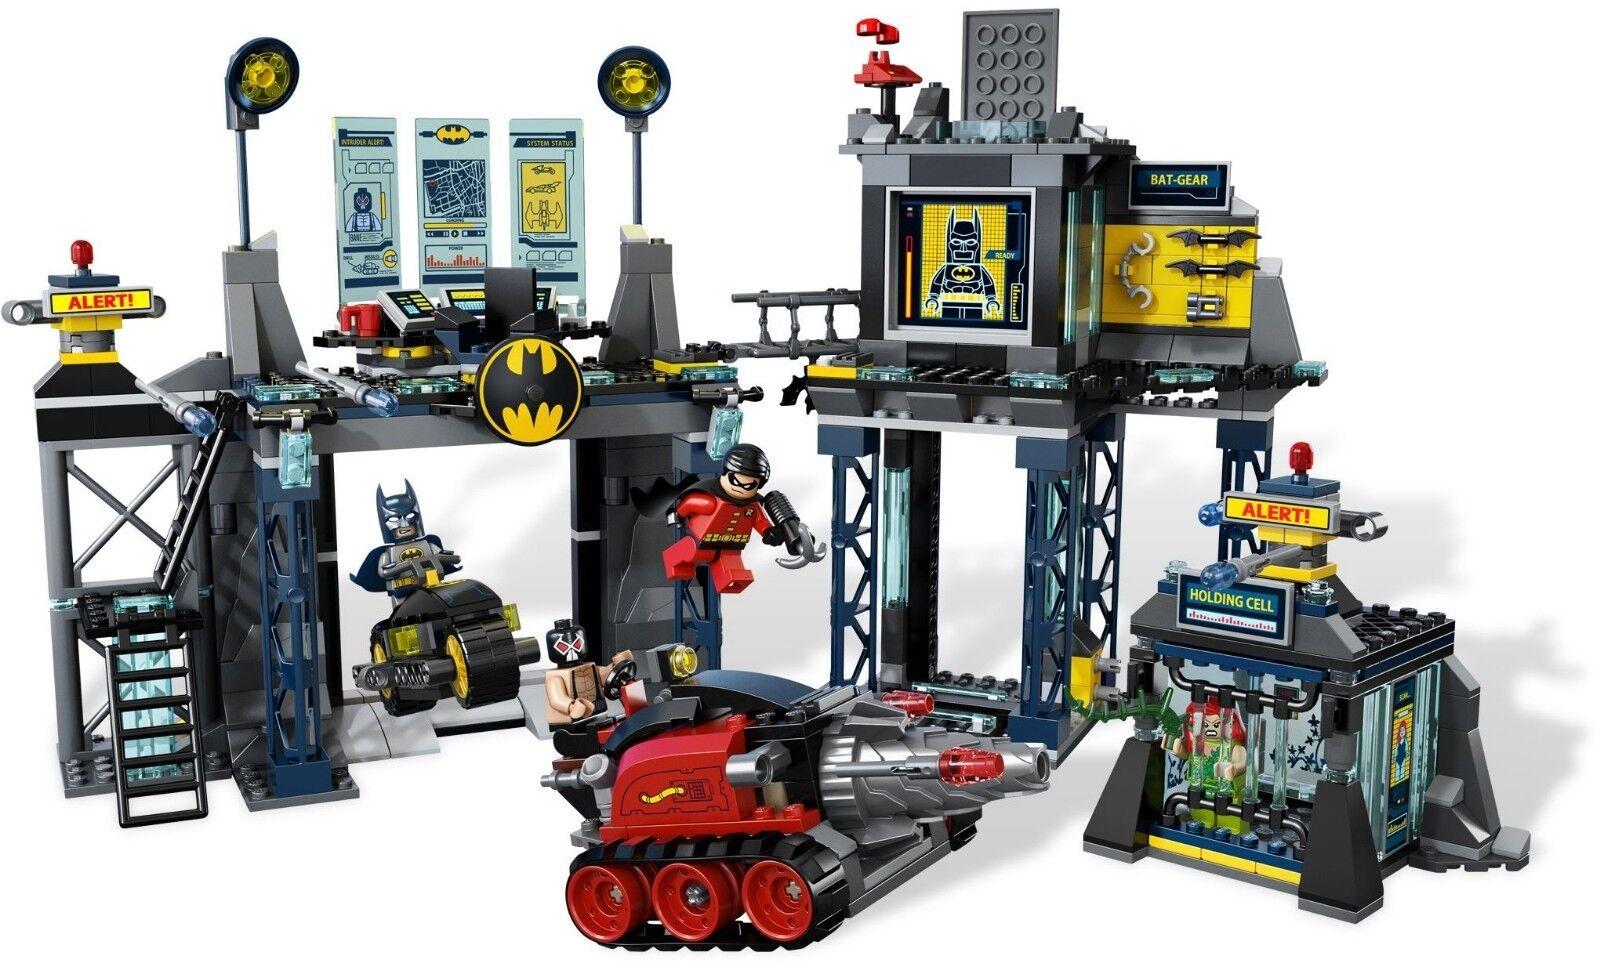 Lego Dc Super Heroes 6860 The Batcave 100% Completo Con Manual Y Minifiguras